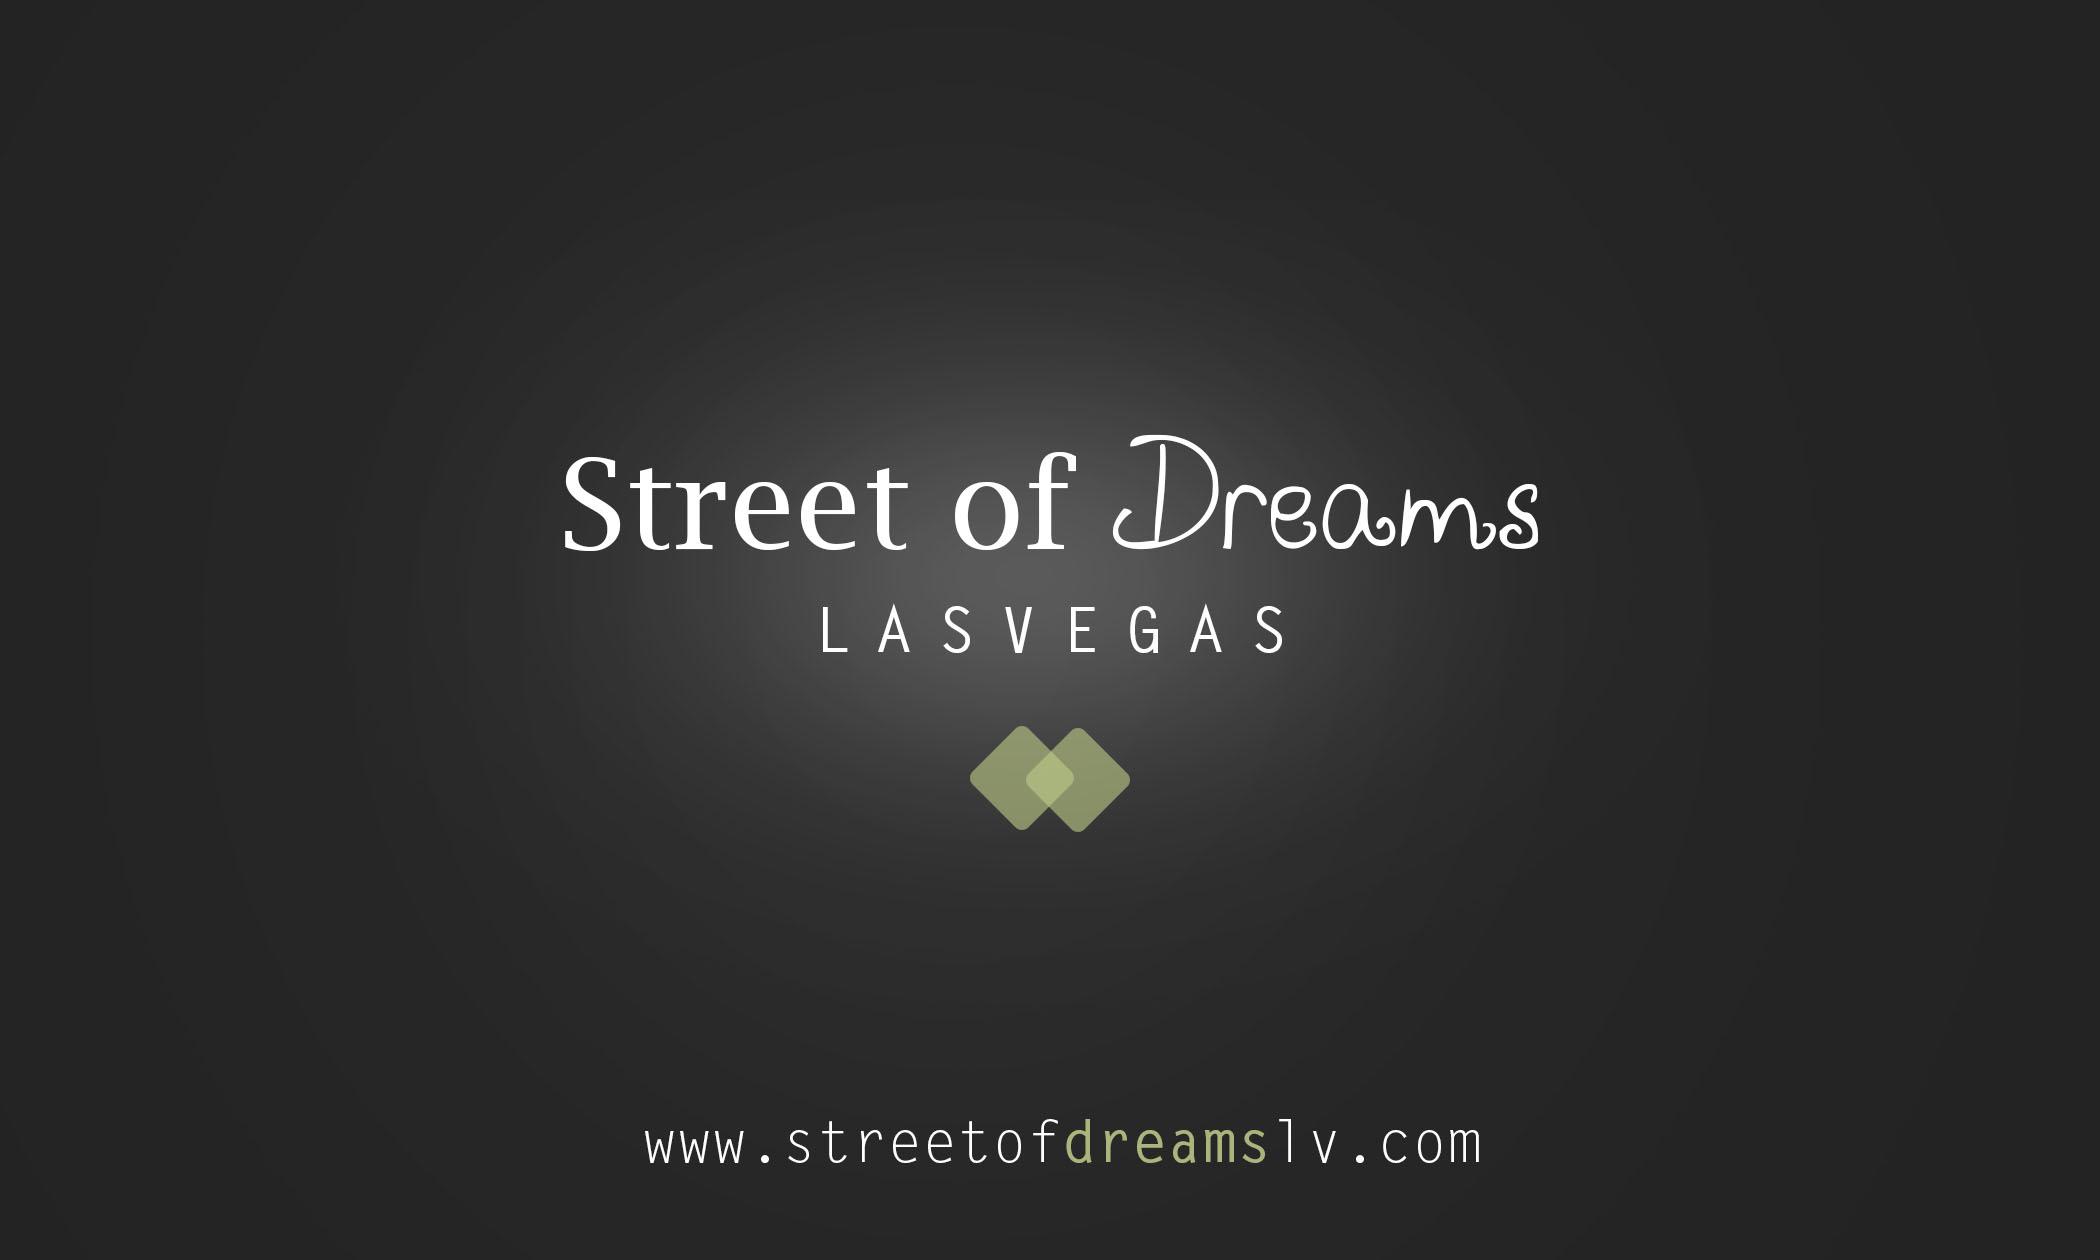 Street of Dreams Las Vegas Logo